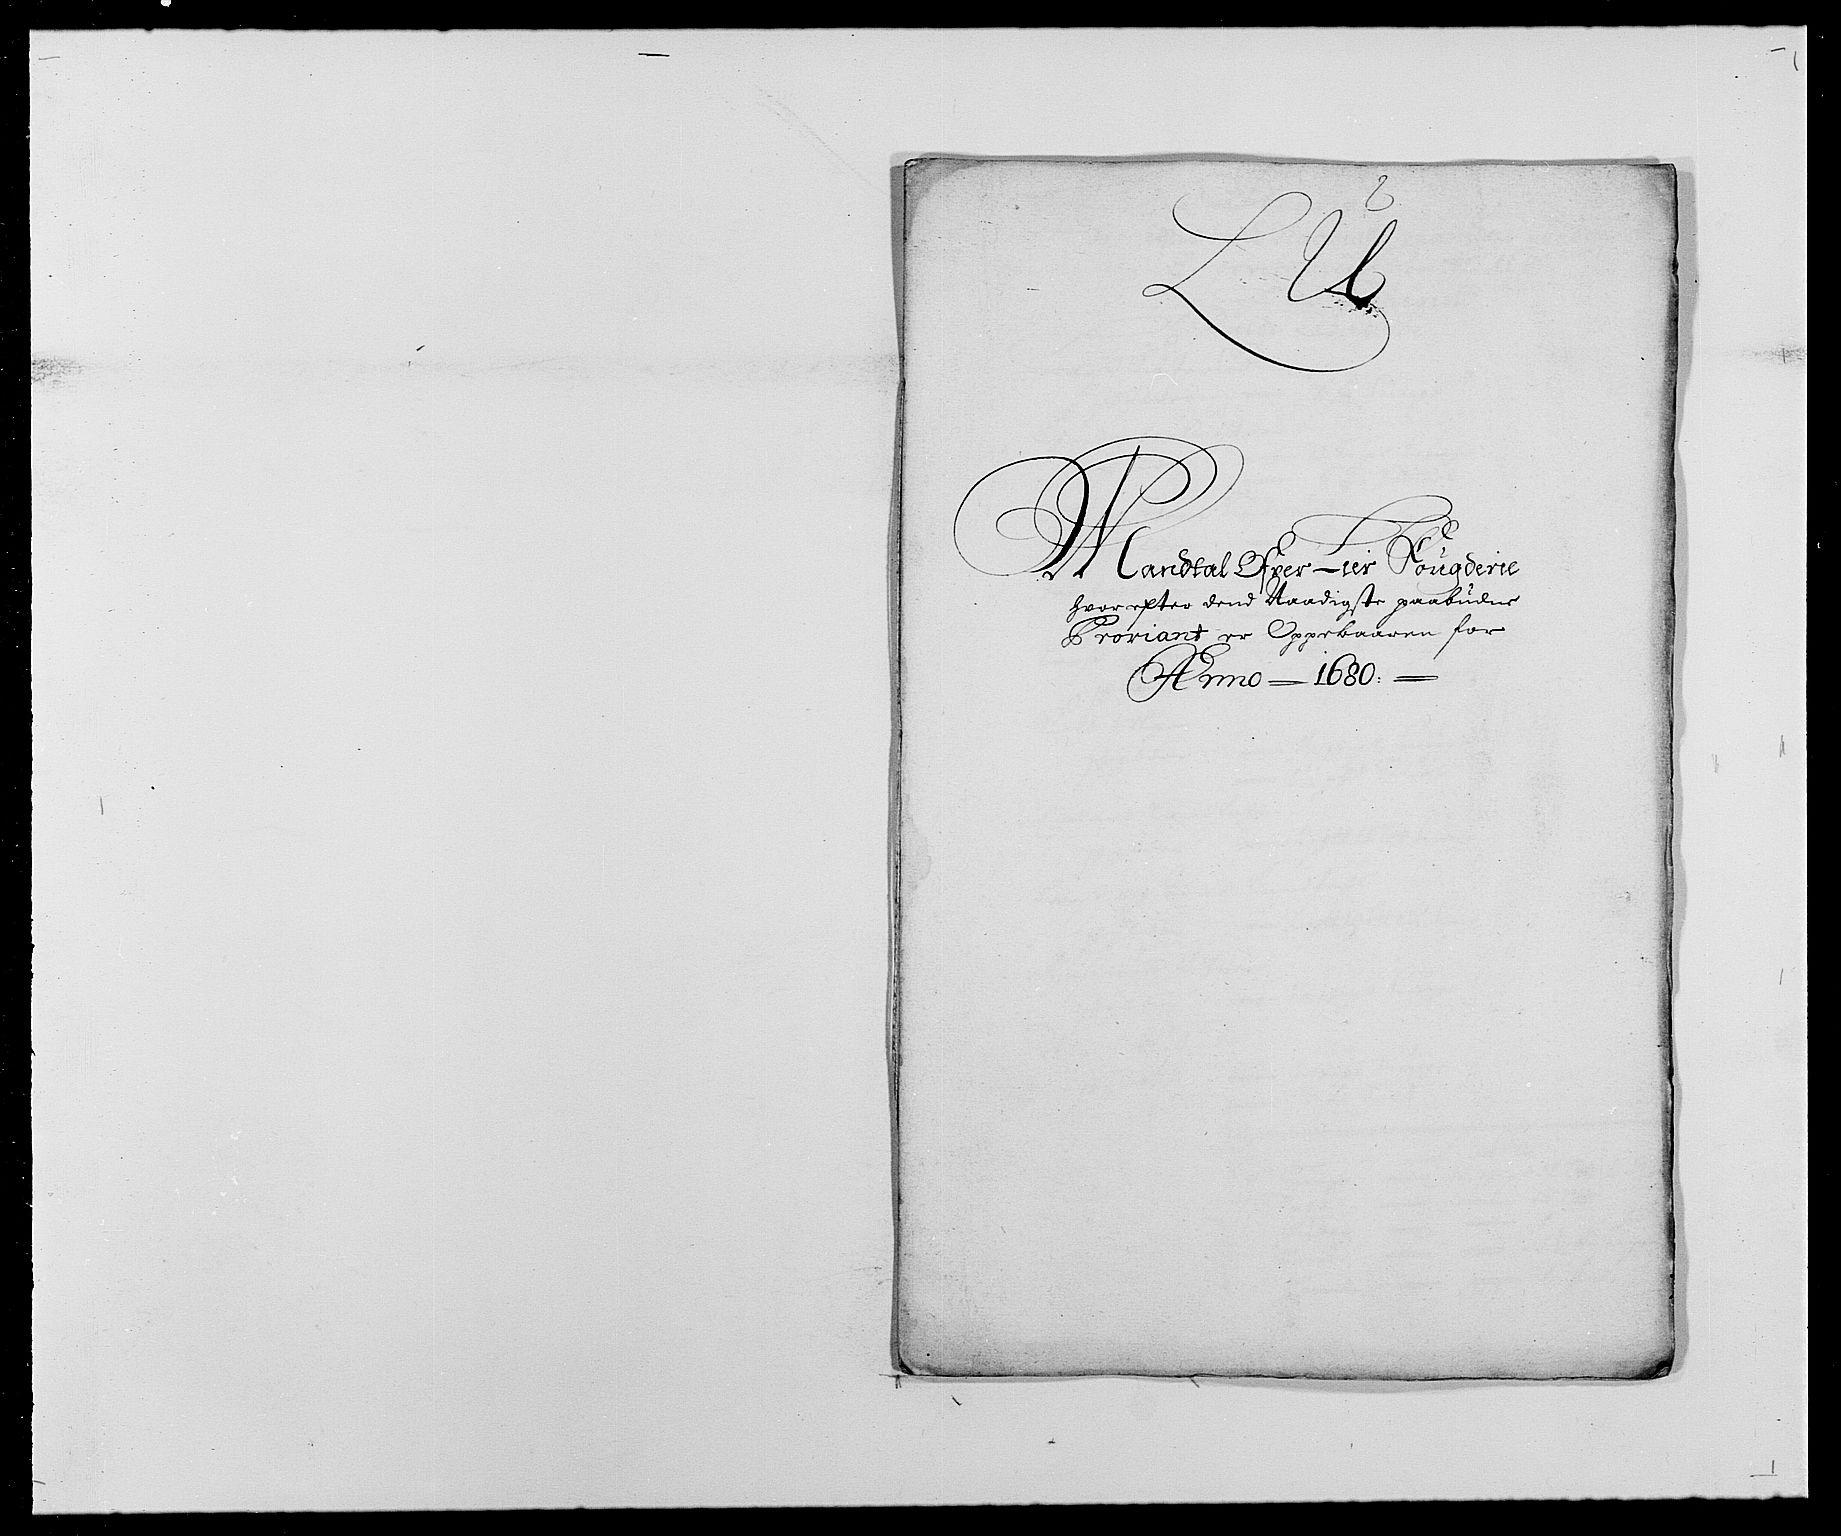 RA, Rentekammeret inntil 1814, Reviderte regnskaper, Fogderegnskap, R27/L1686: Fogderegnskap Lier, 1678-1686, s. 256